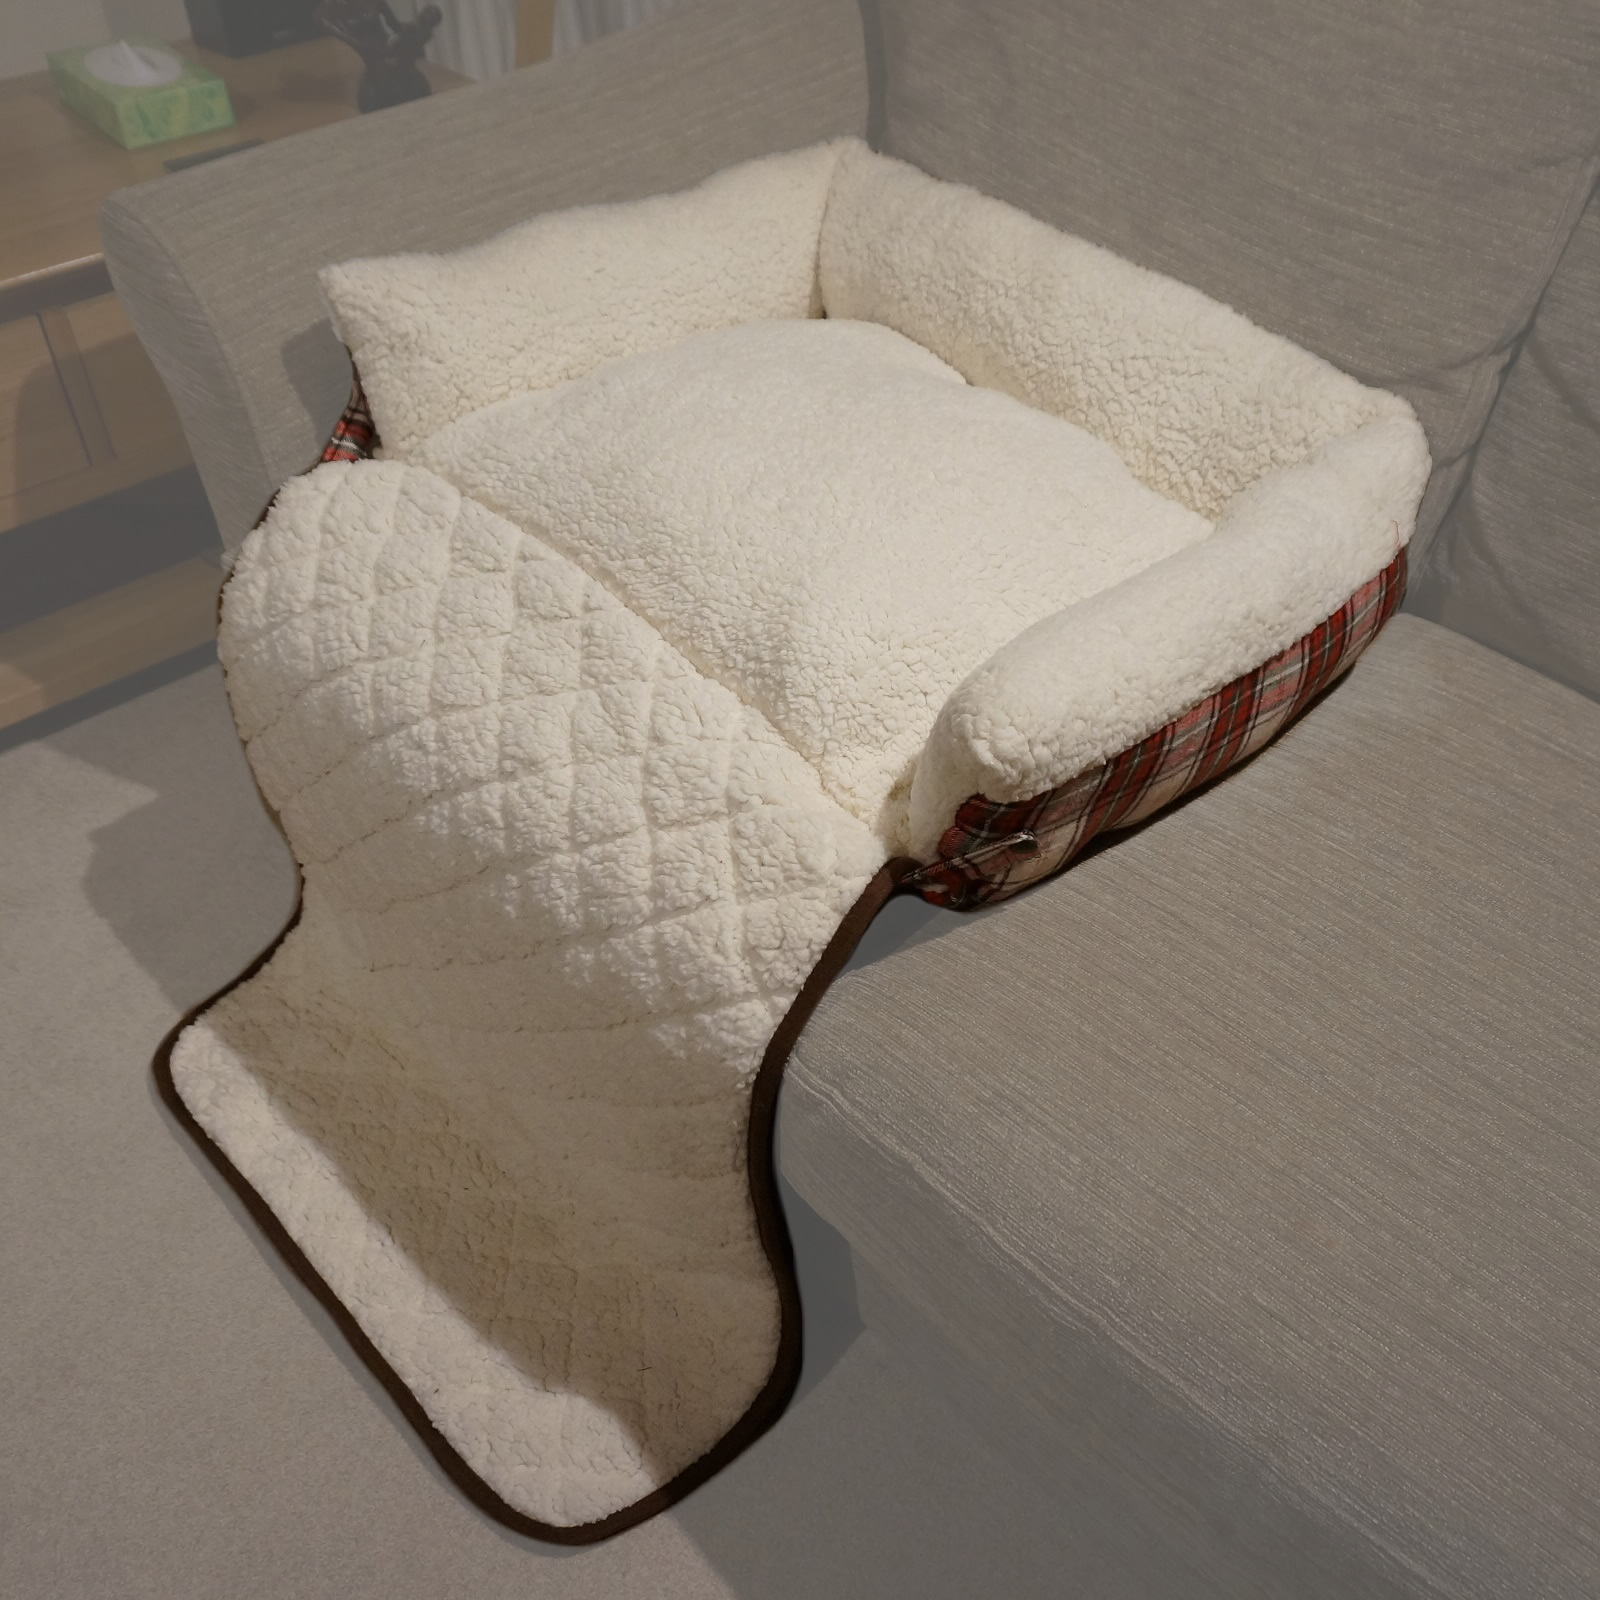 Non Slip Sofa Cover Uk – Hereo Sofa